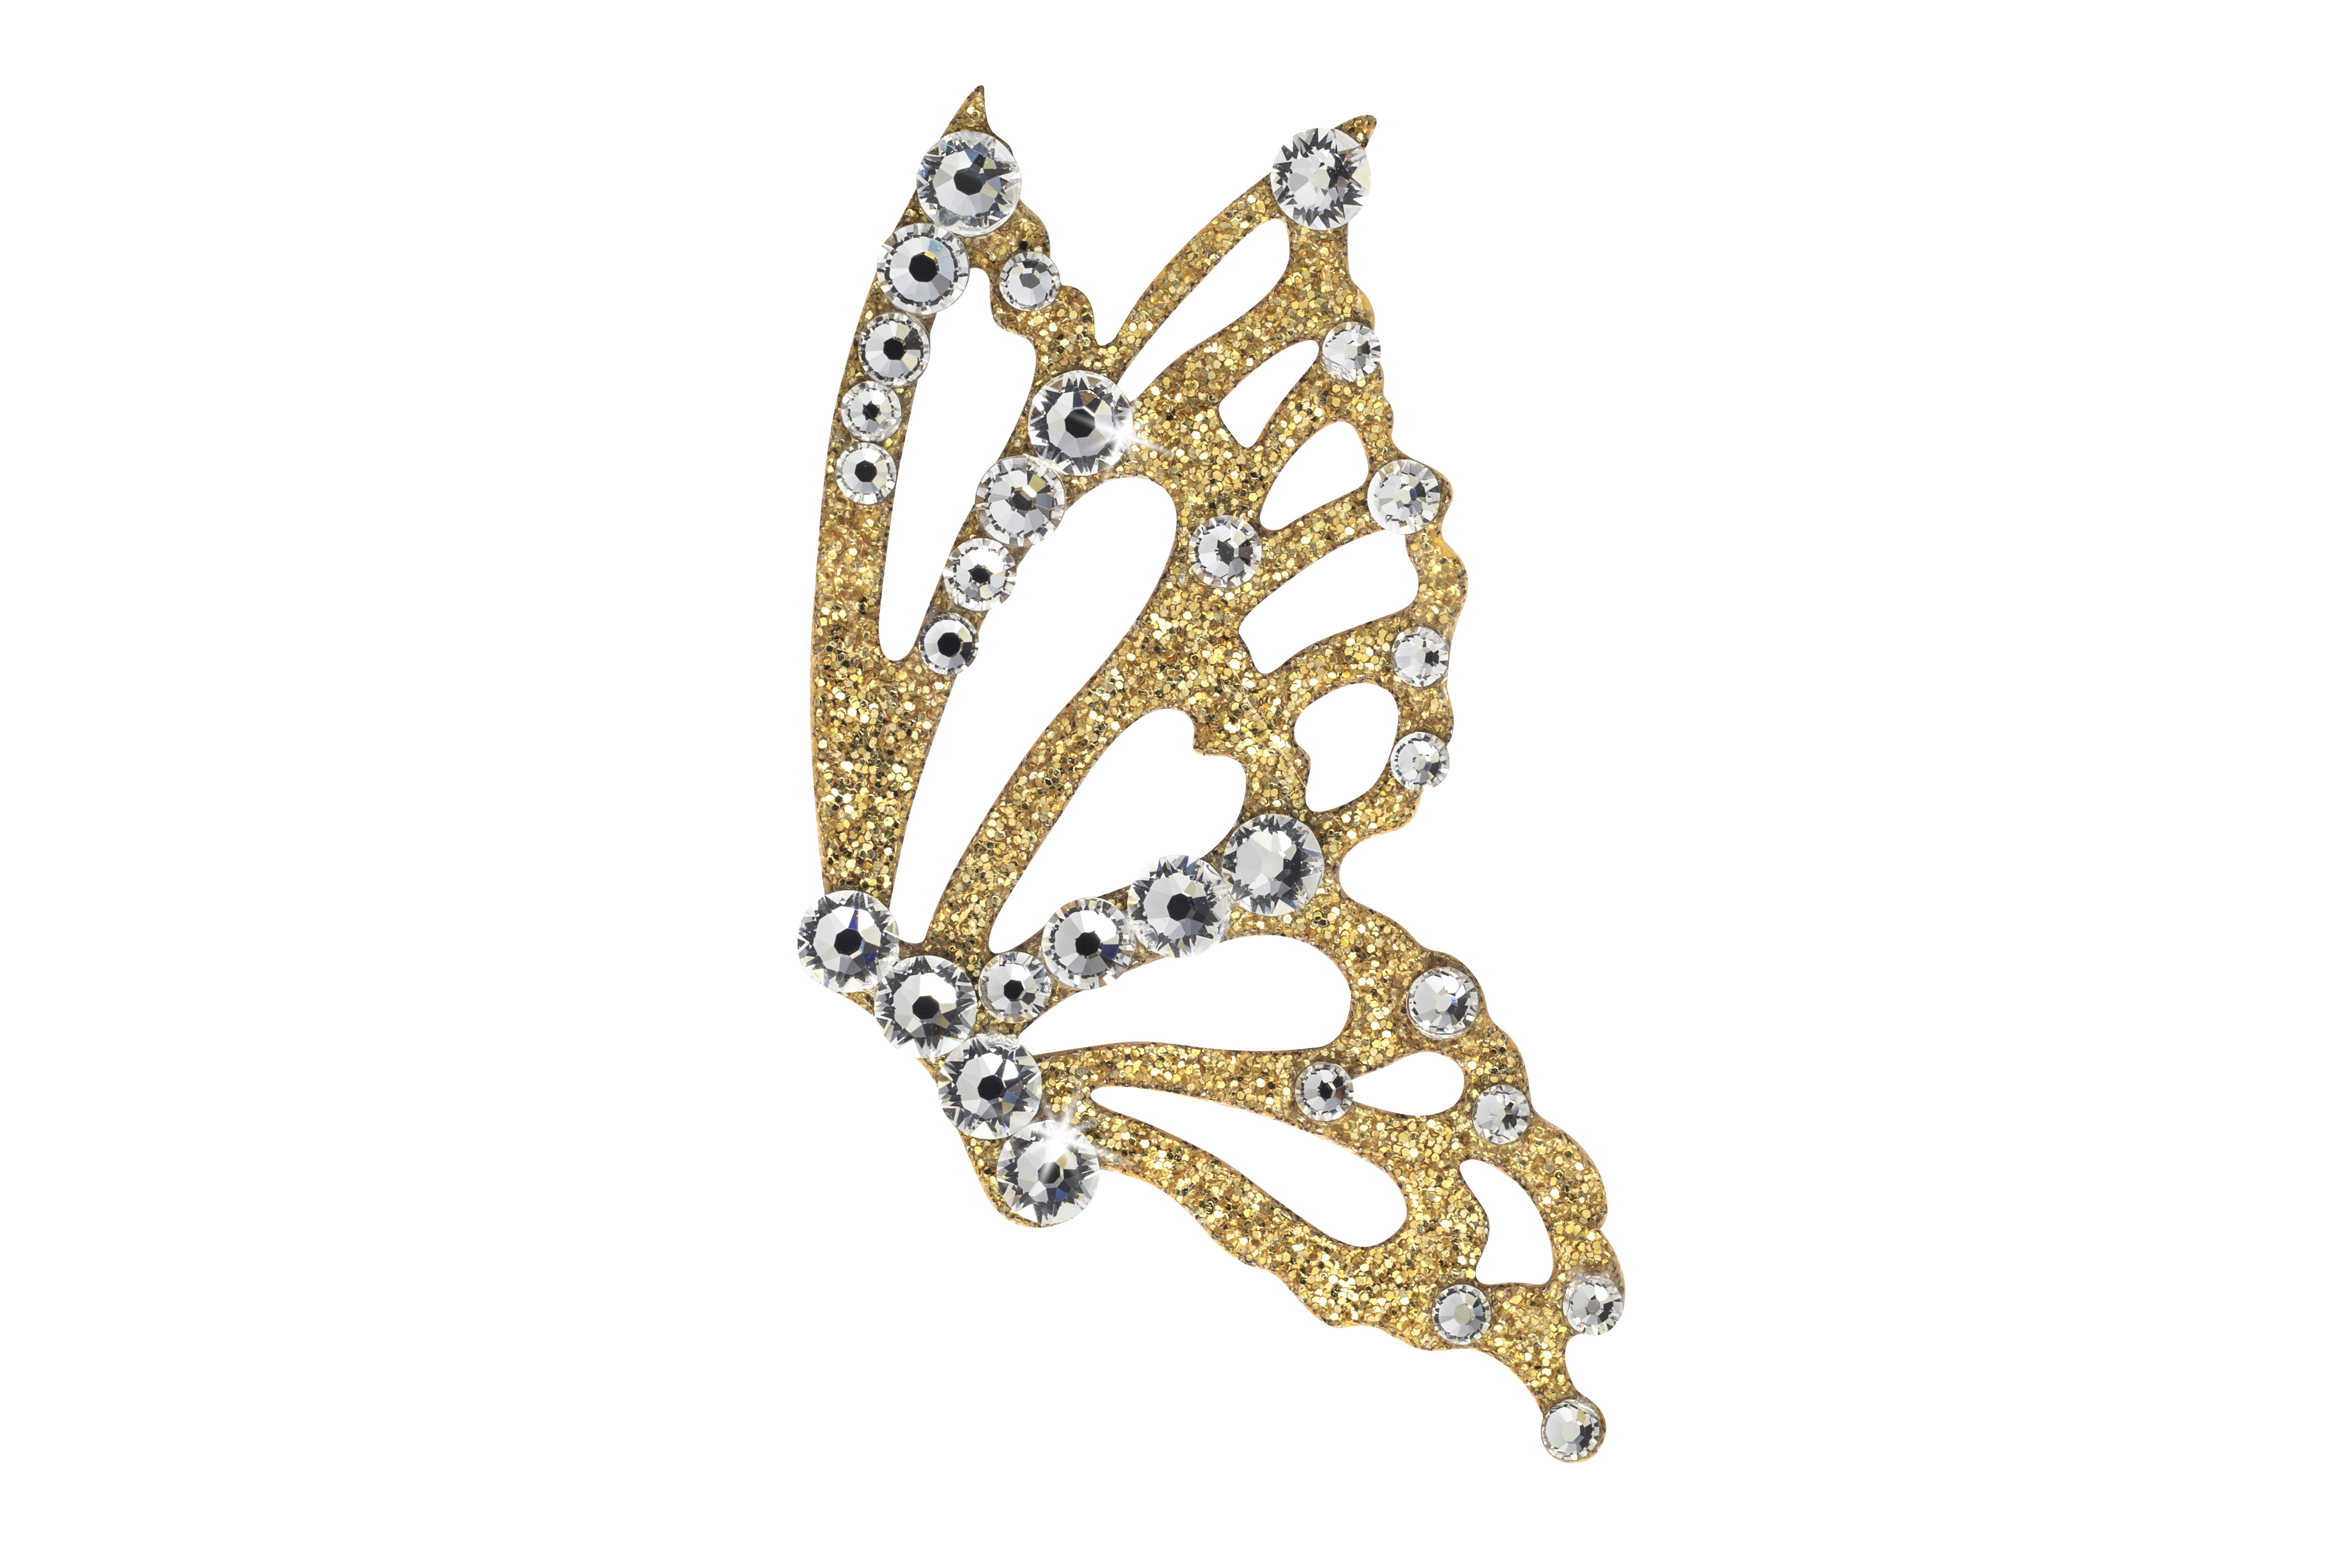 Načančaná.cz Dámské šperky na tělo zlatý Motýl - 3 barvy Barva: Crystal